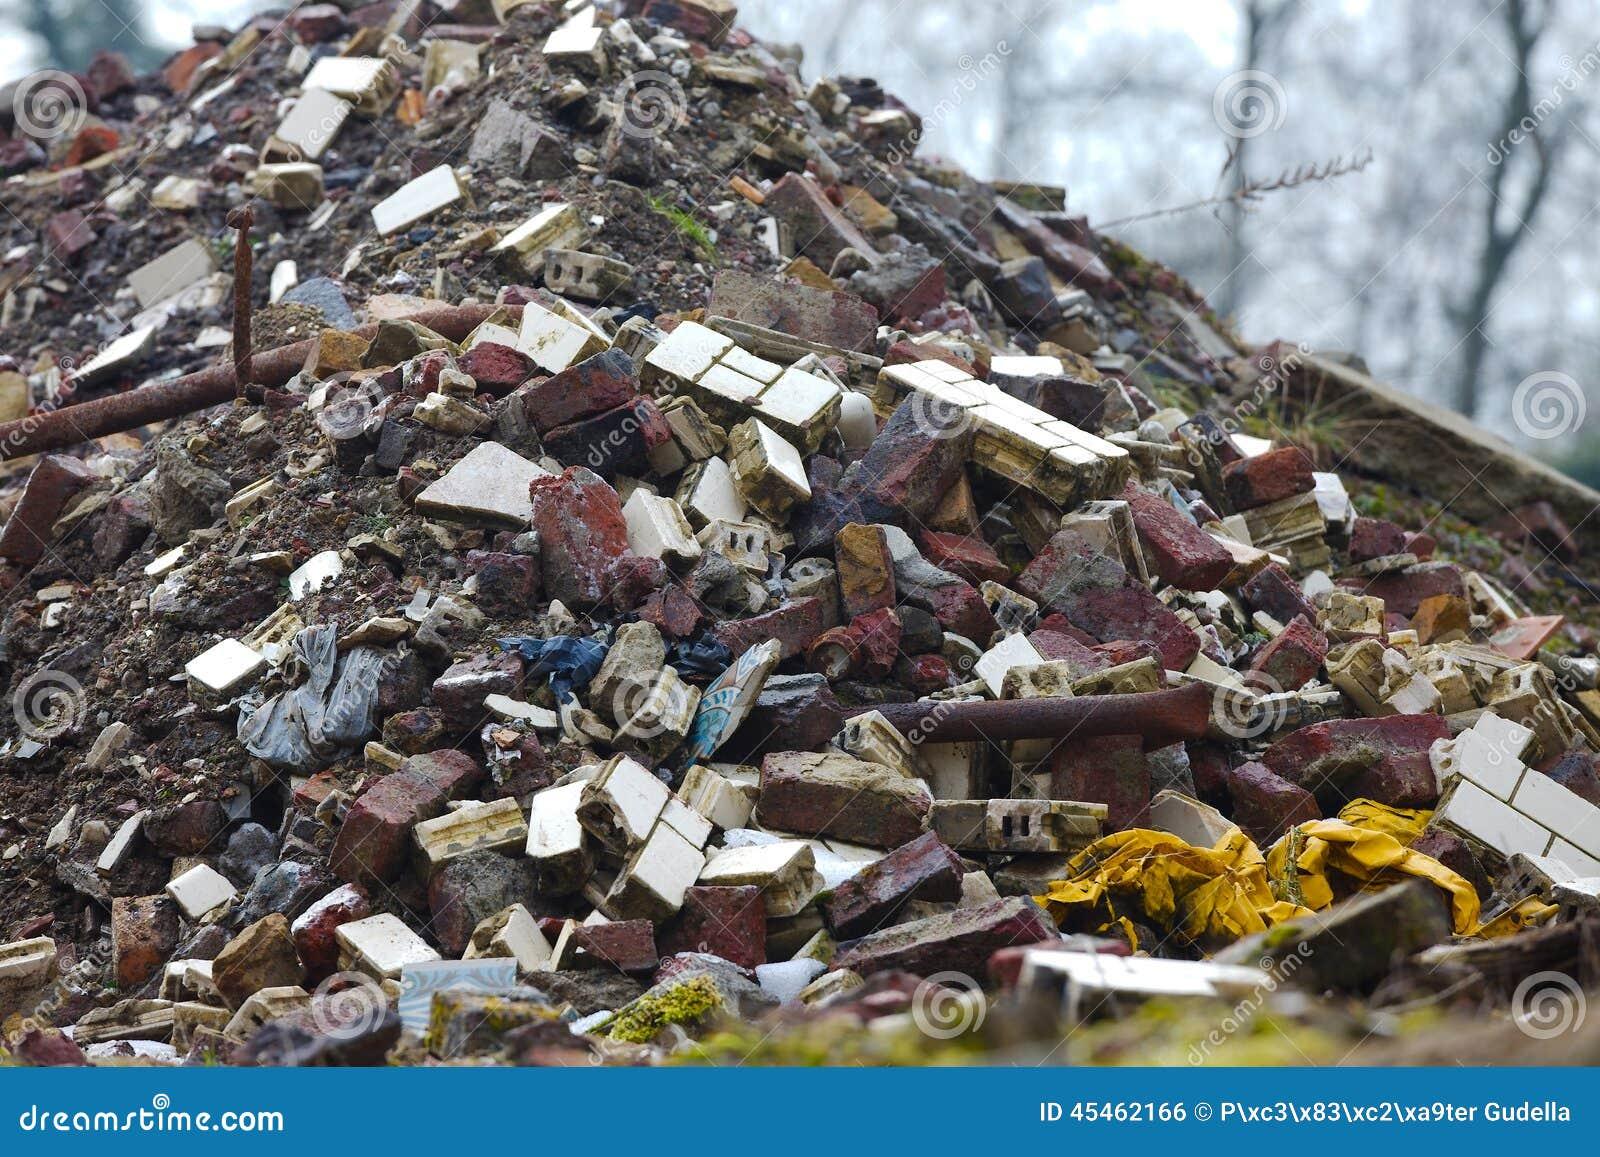 Pile Of Building Debris : Debris pile stock photo image